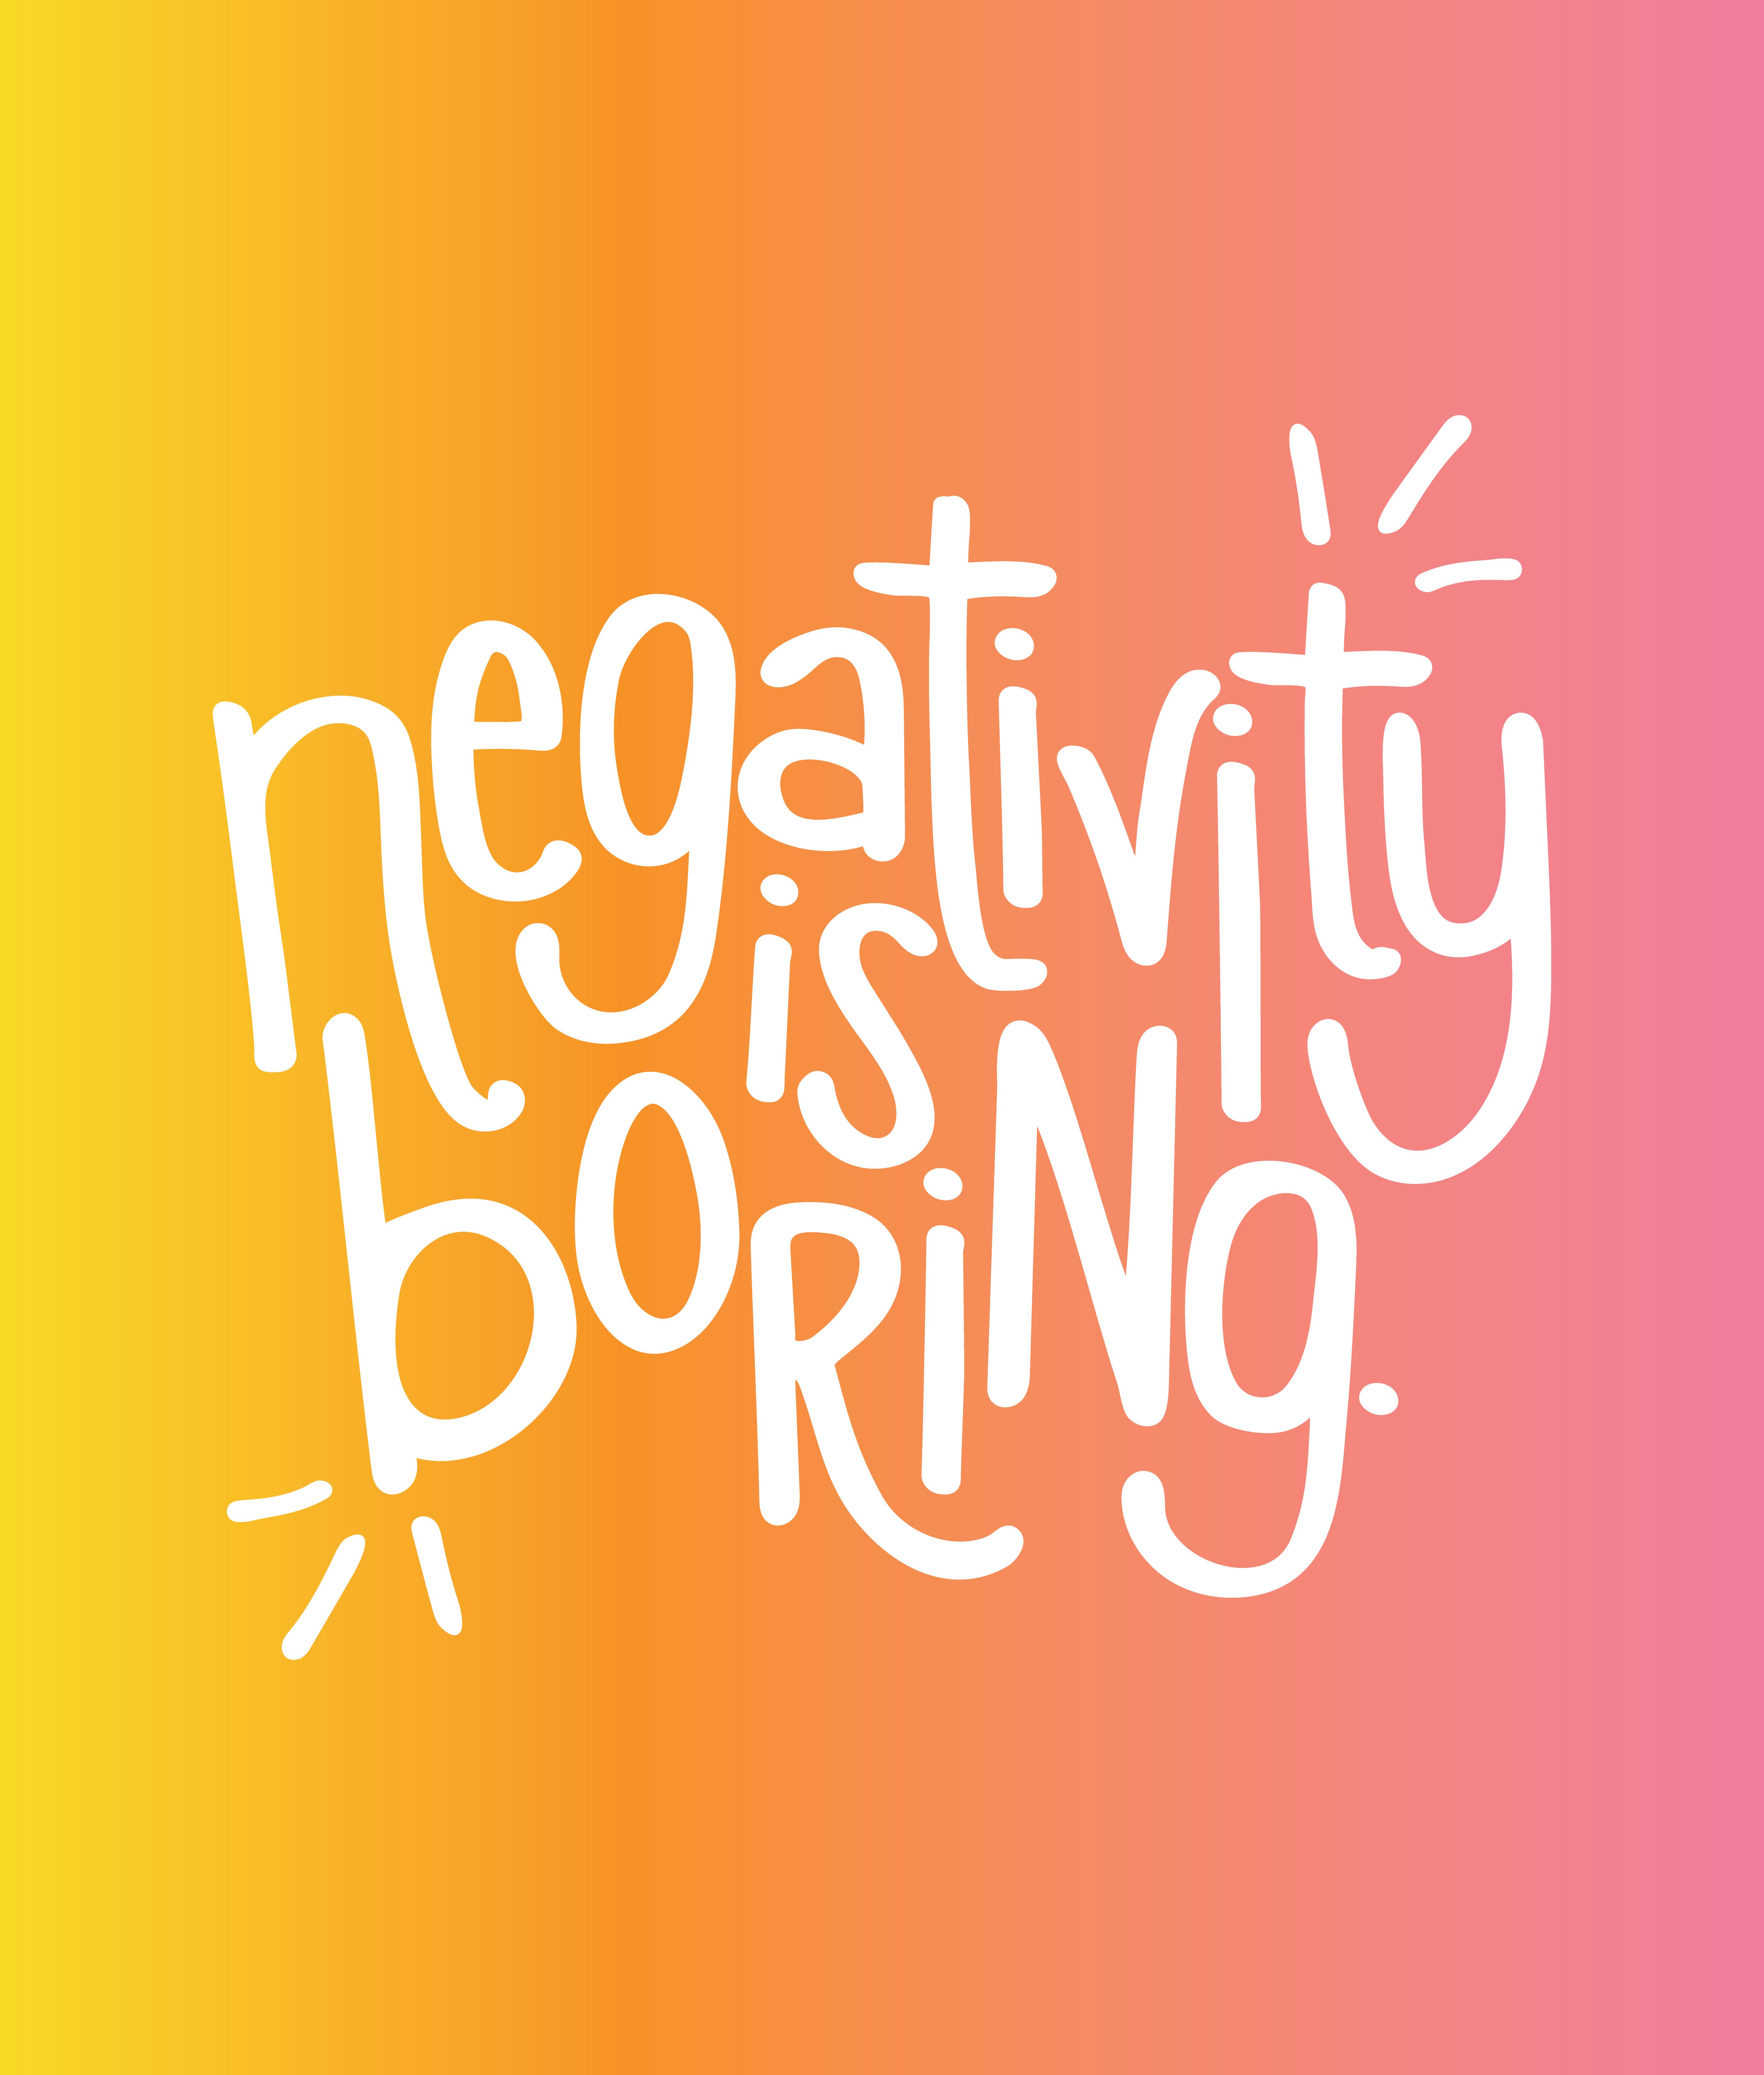 negativity is boring